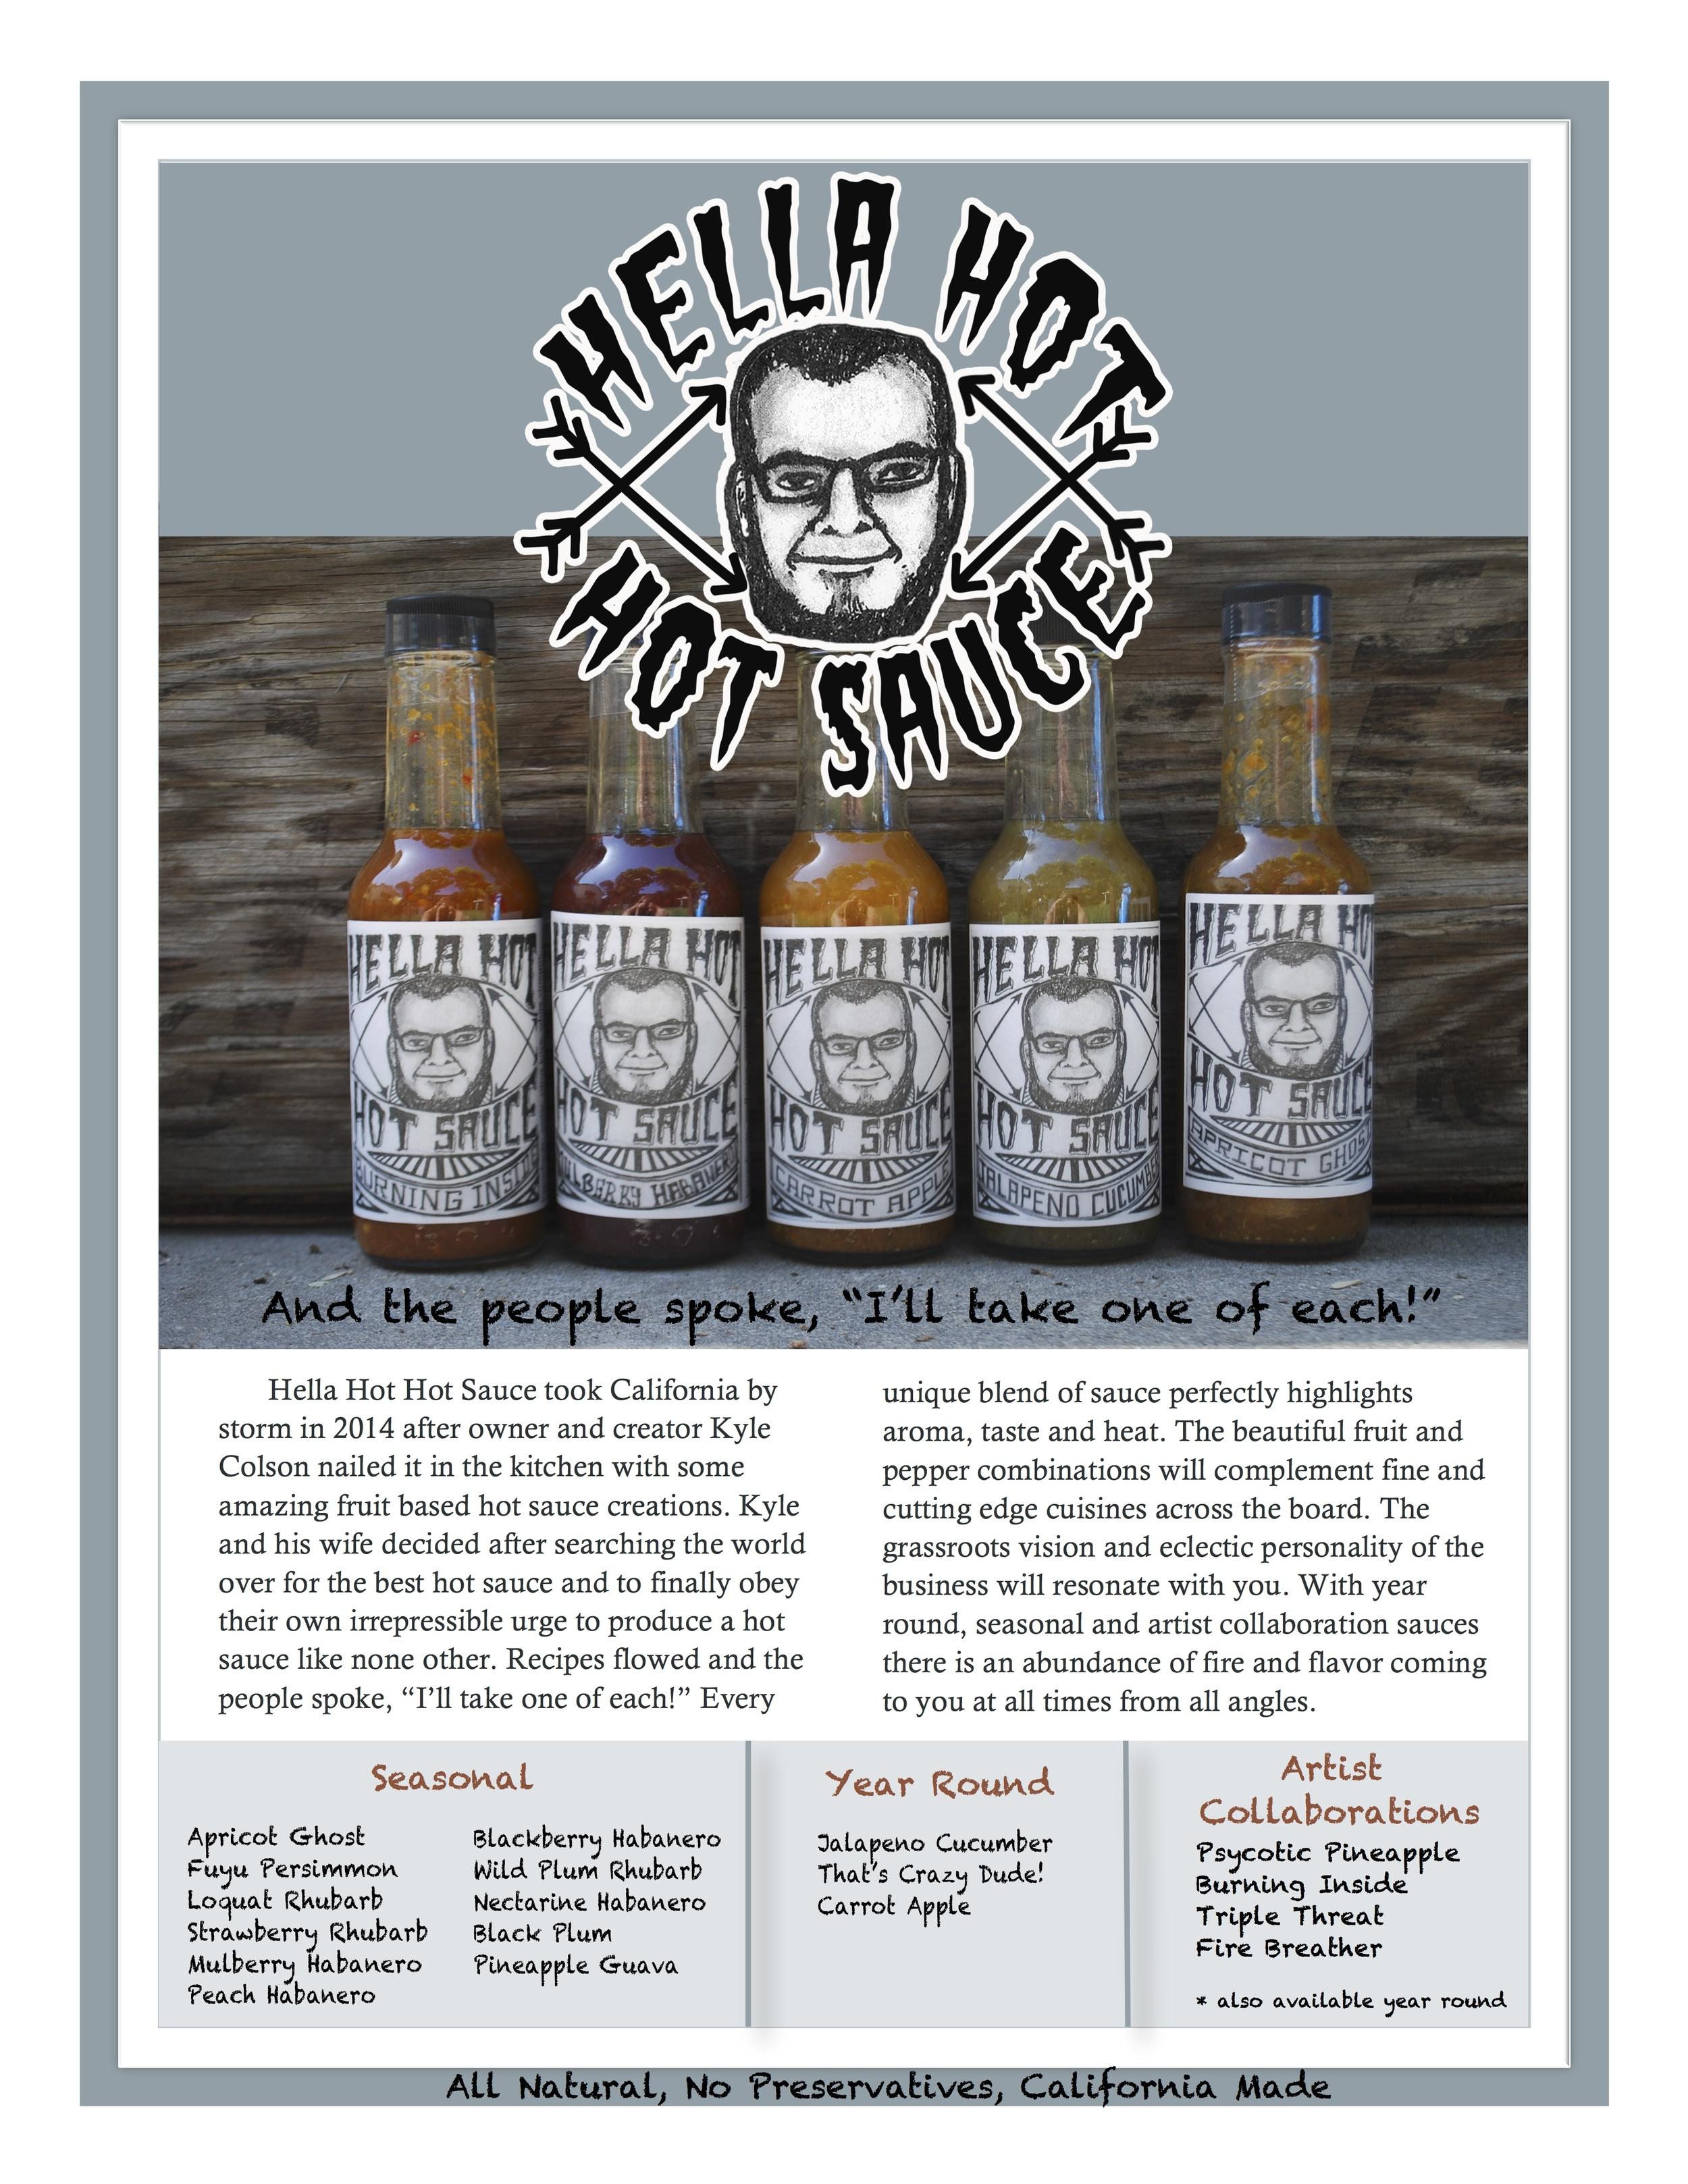 Hella Hot Hot Sauce Marketing Brochure